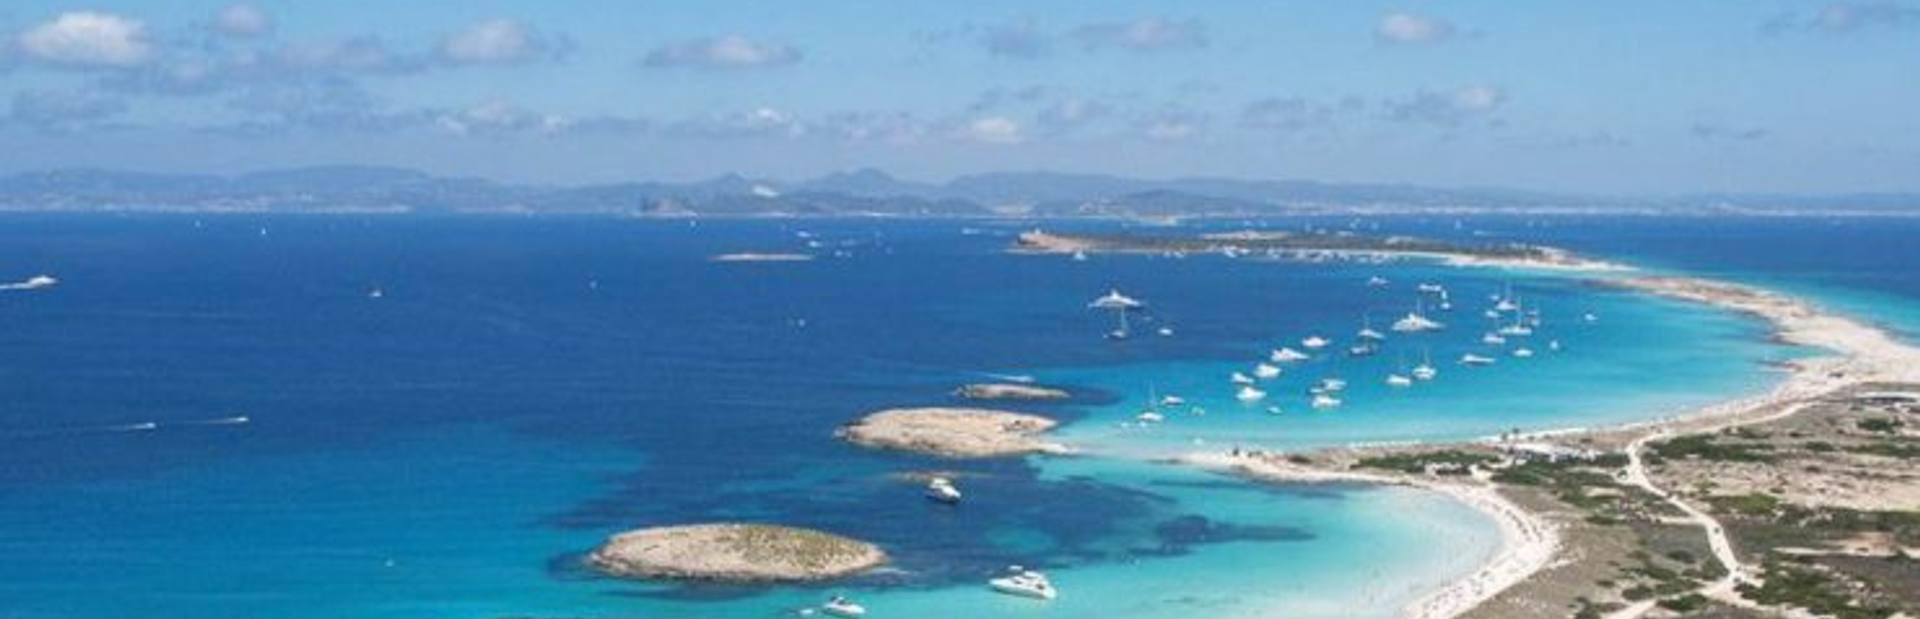 Formentera charter itineraries